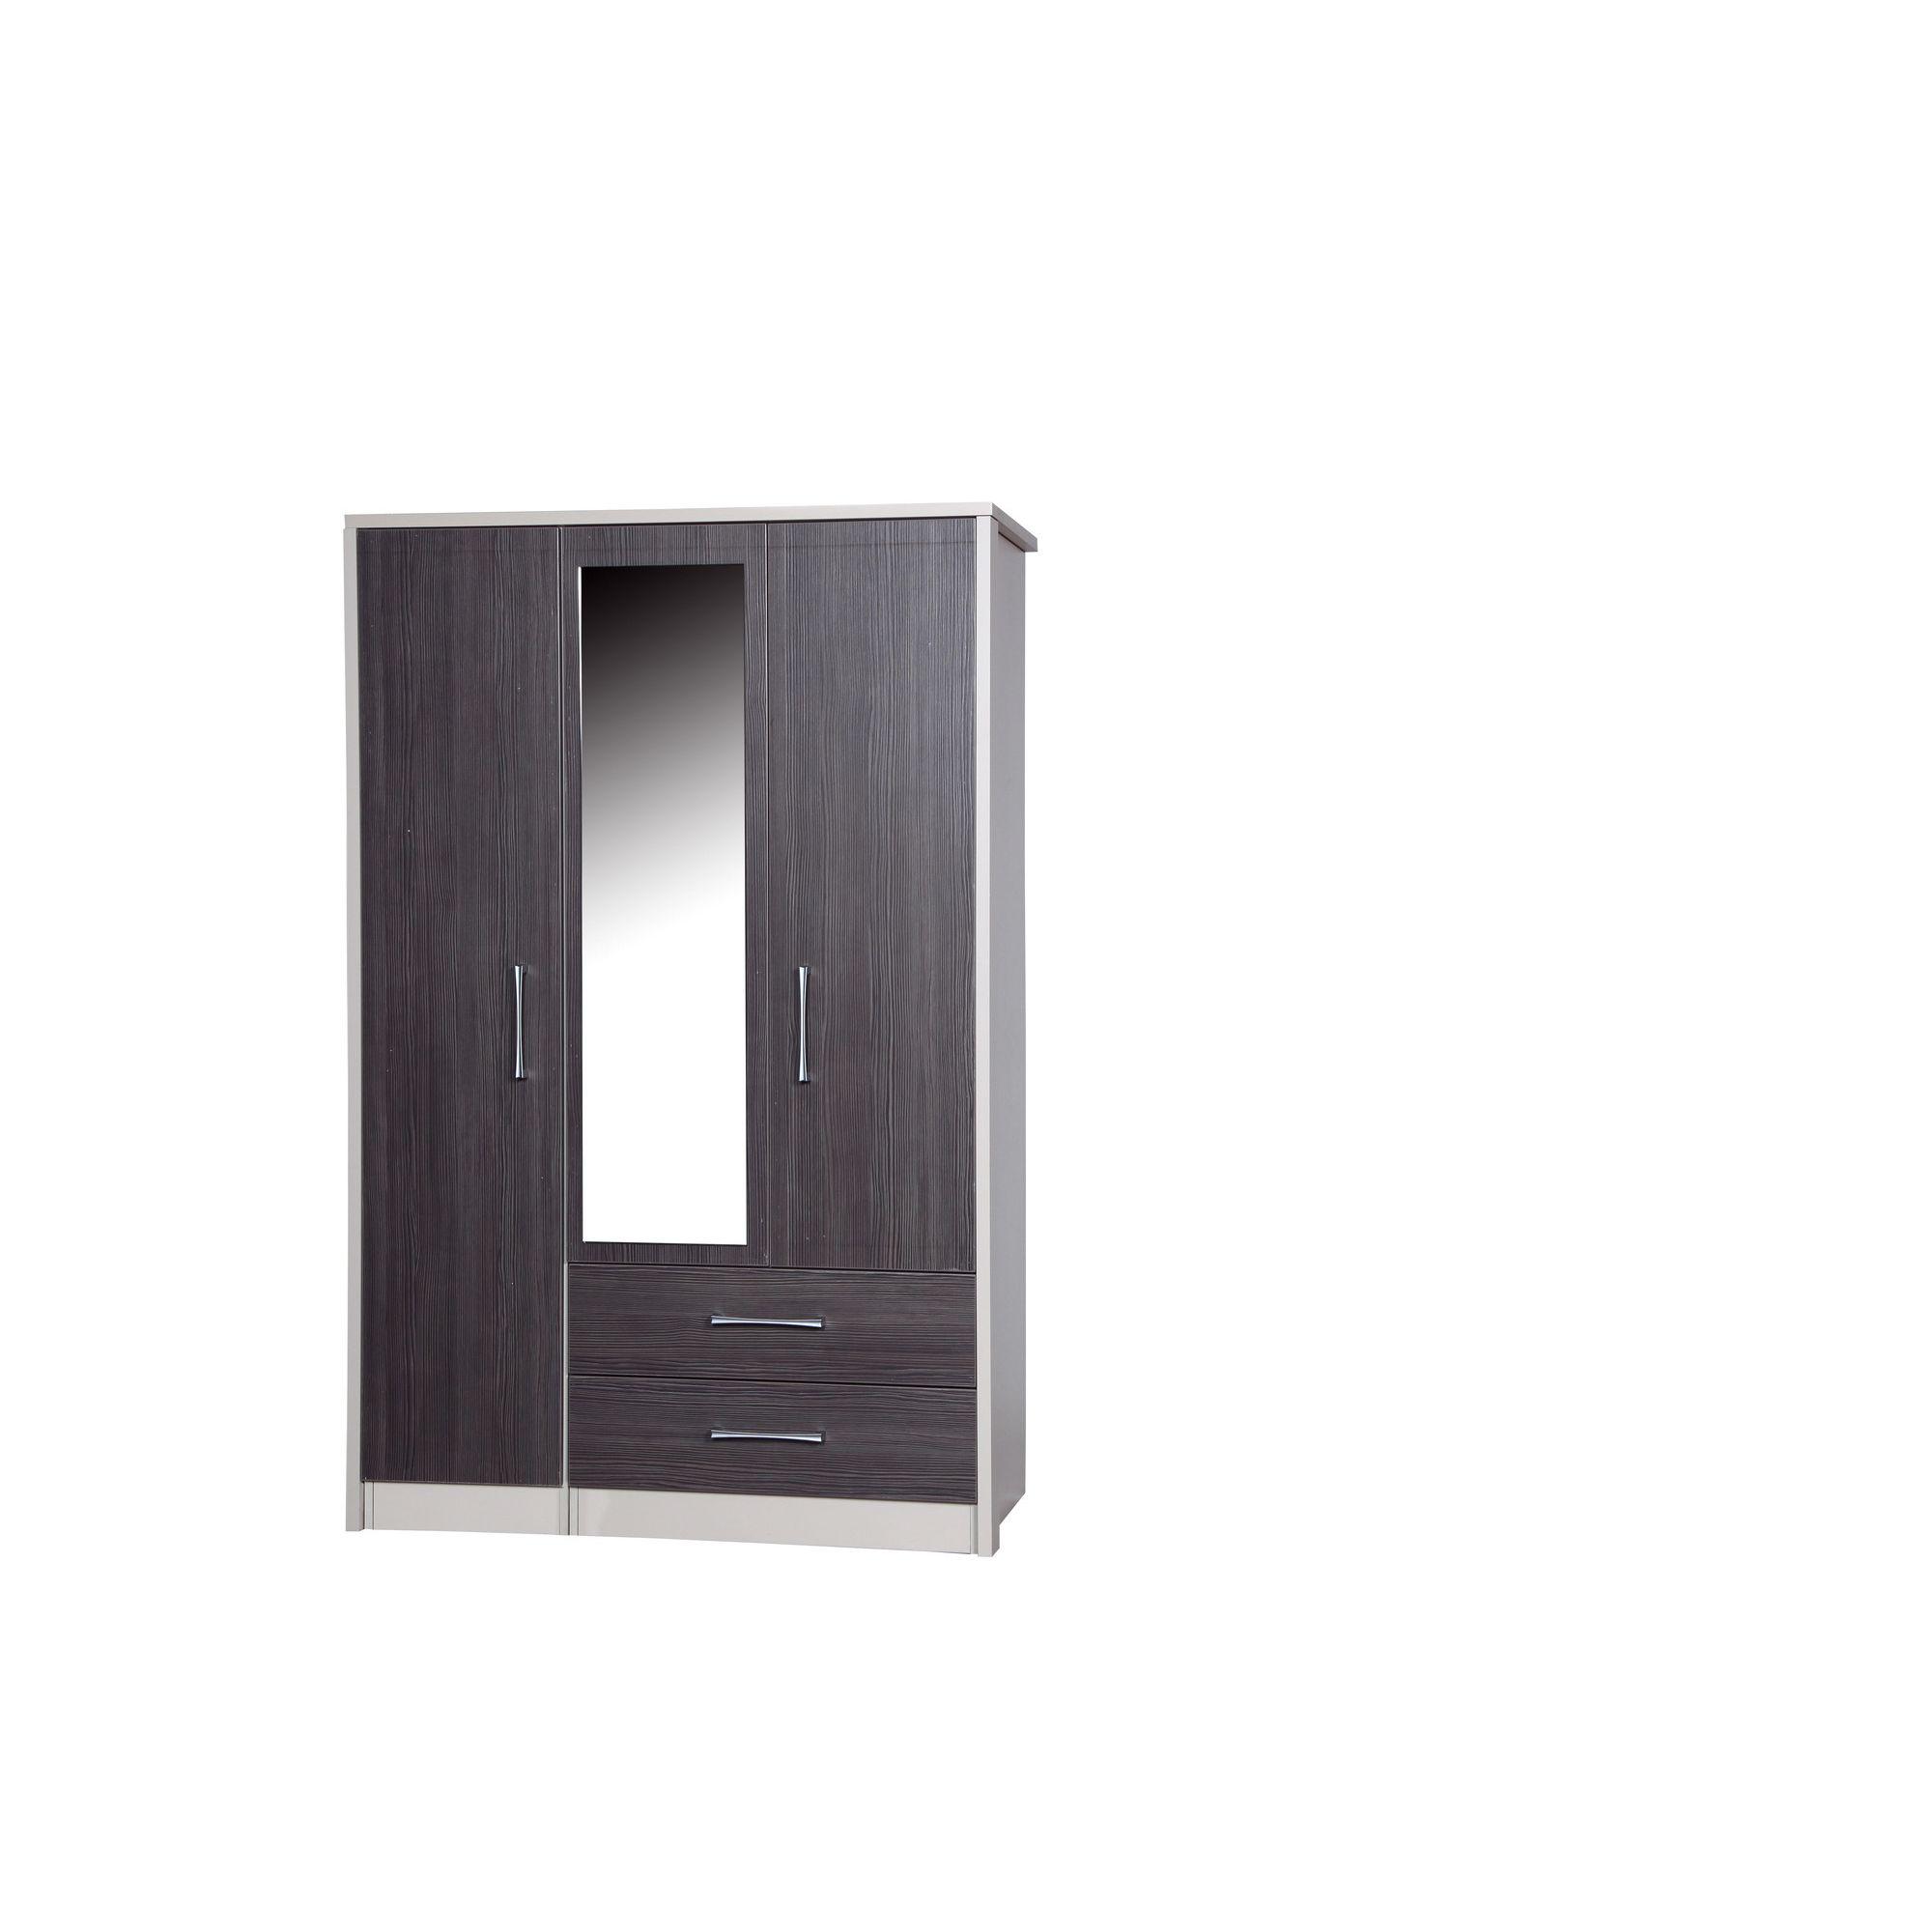 Alto Furniture Avola 3 Door Combi Wardrobe with Mirror - Cream Carcass With Grey Avola at Tesco Direct